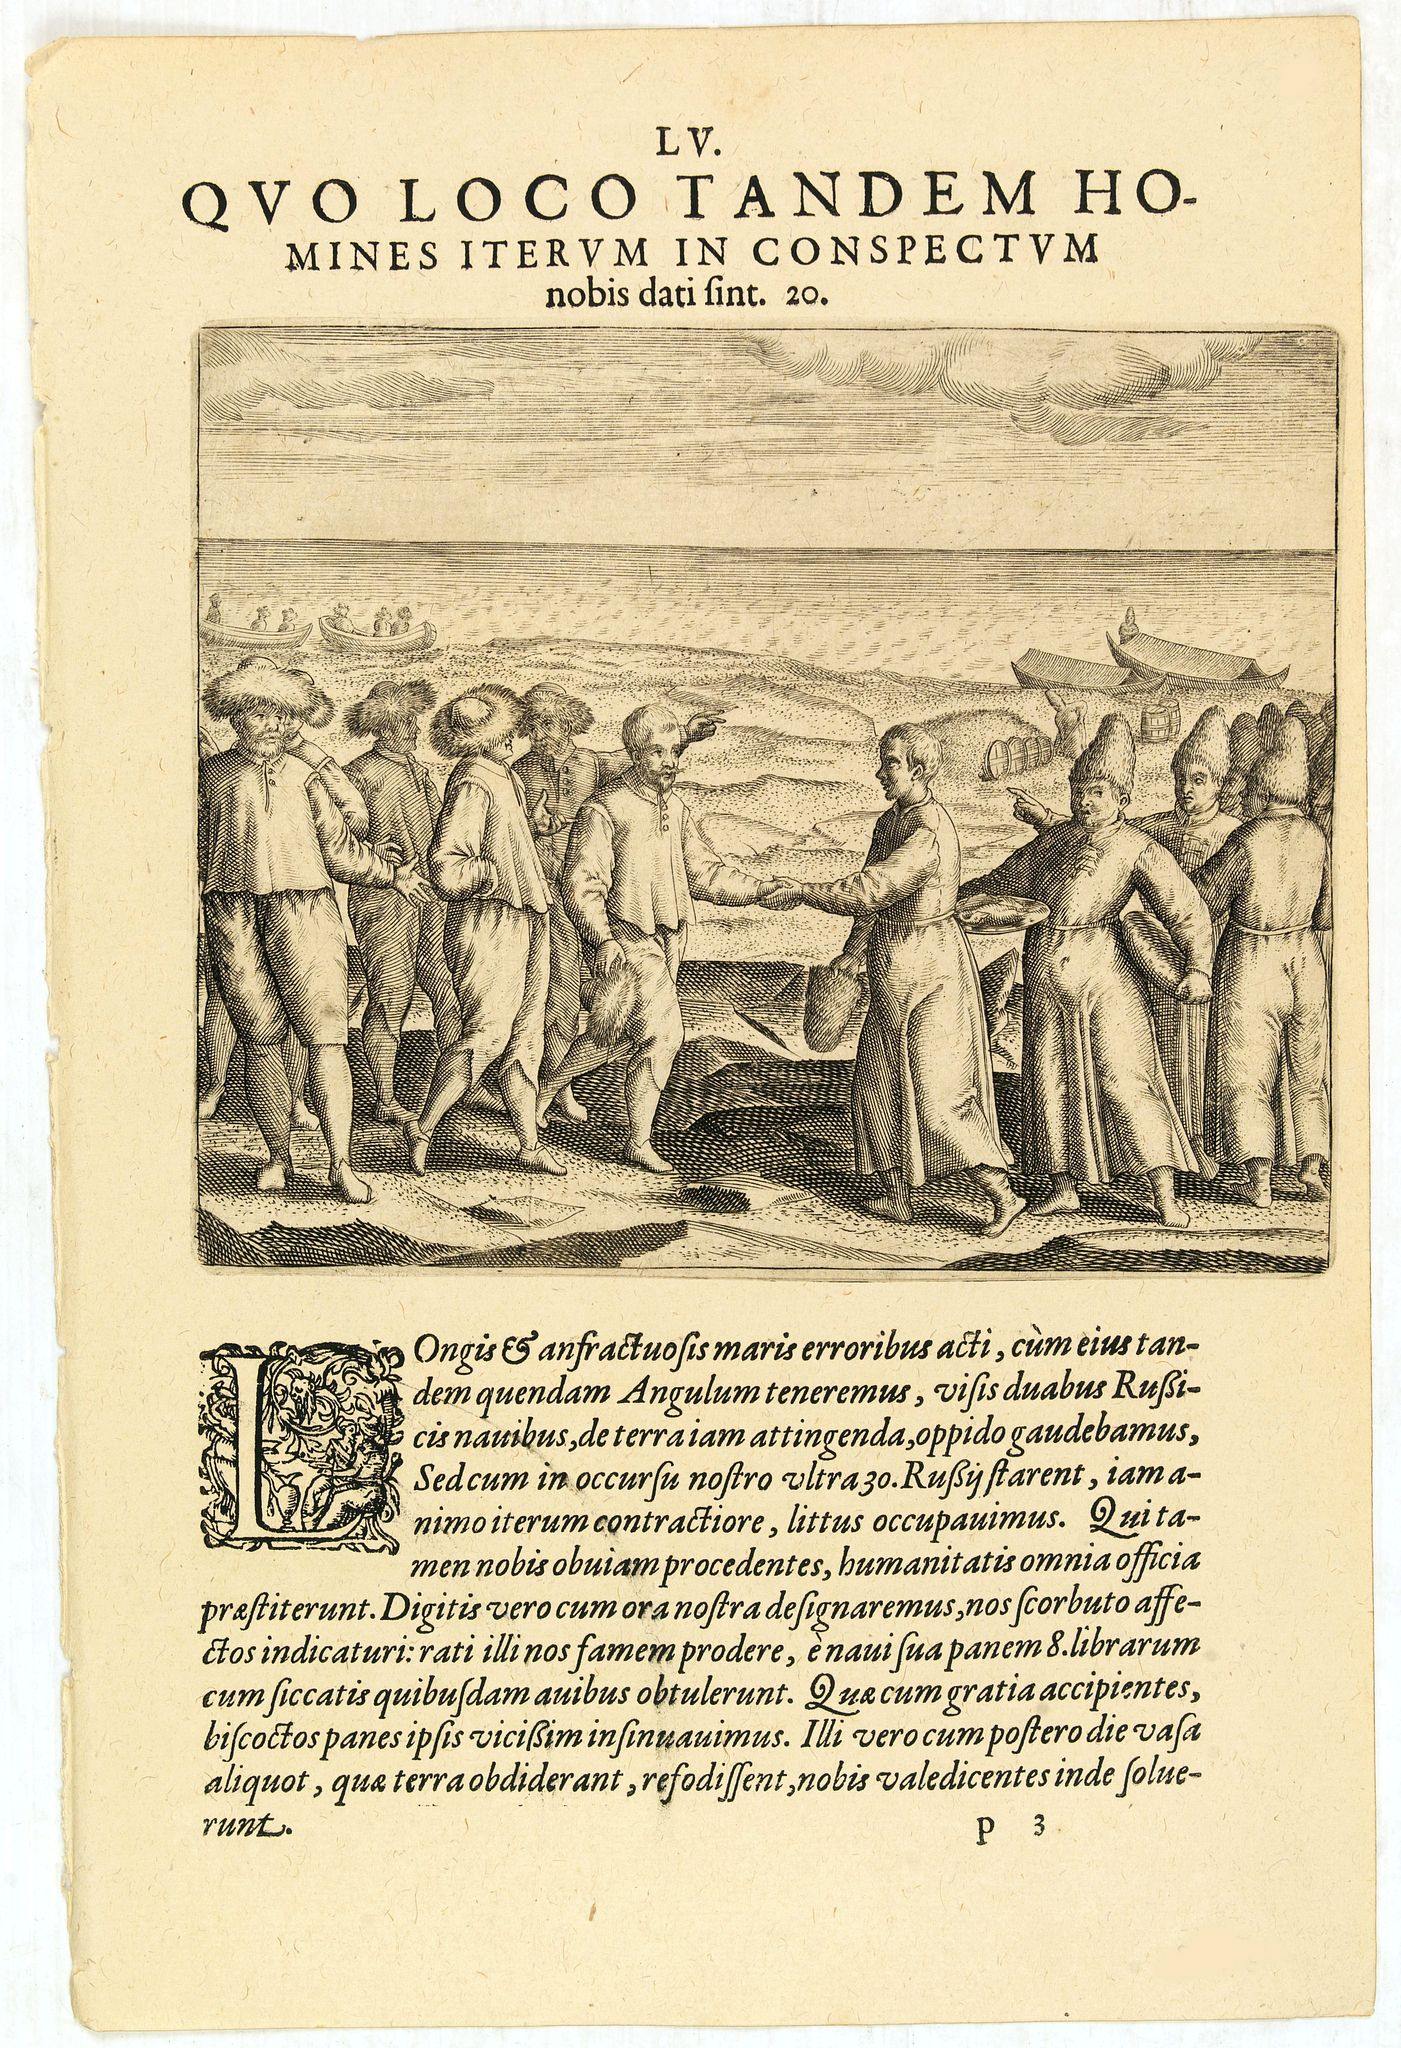 DE BRY, Th. -  LV. Quo loco tandem homines iterum in conspectum nobis dati sint 20. (The third Dutch artic voyage by W.Barentsz.)